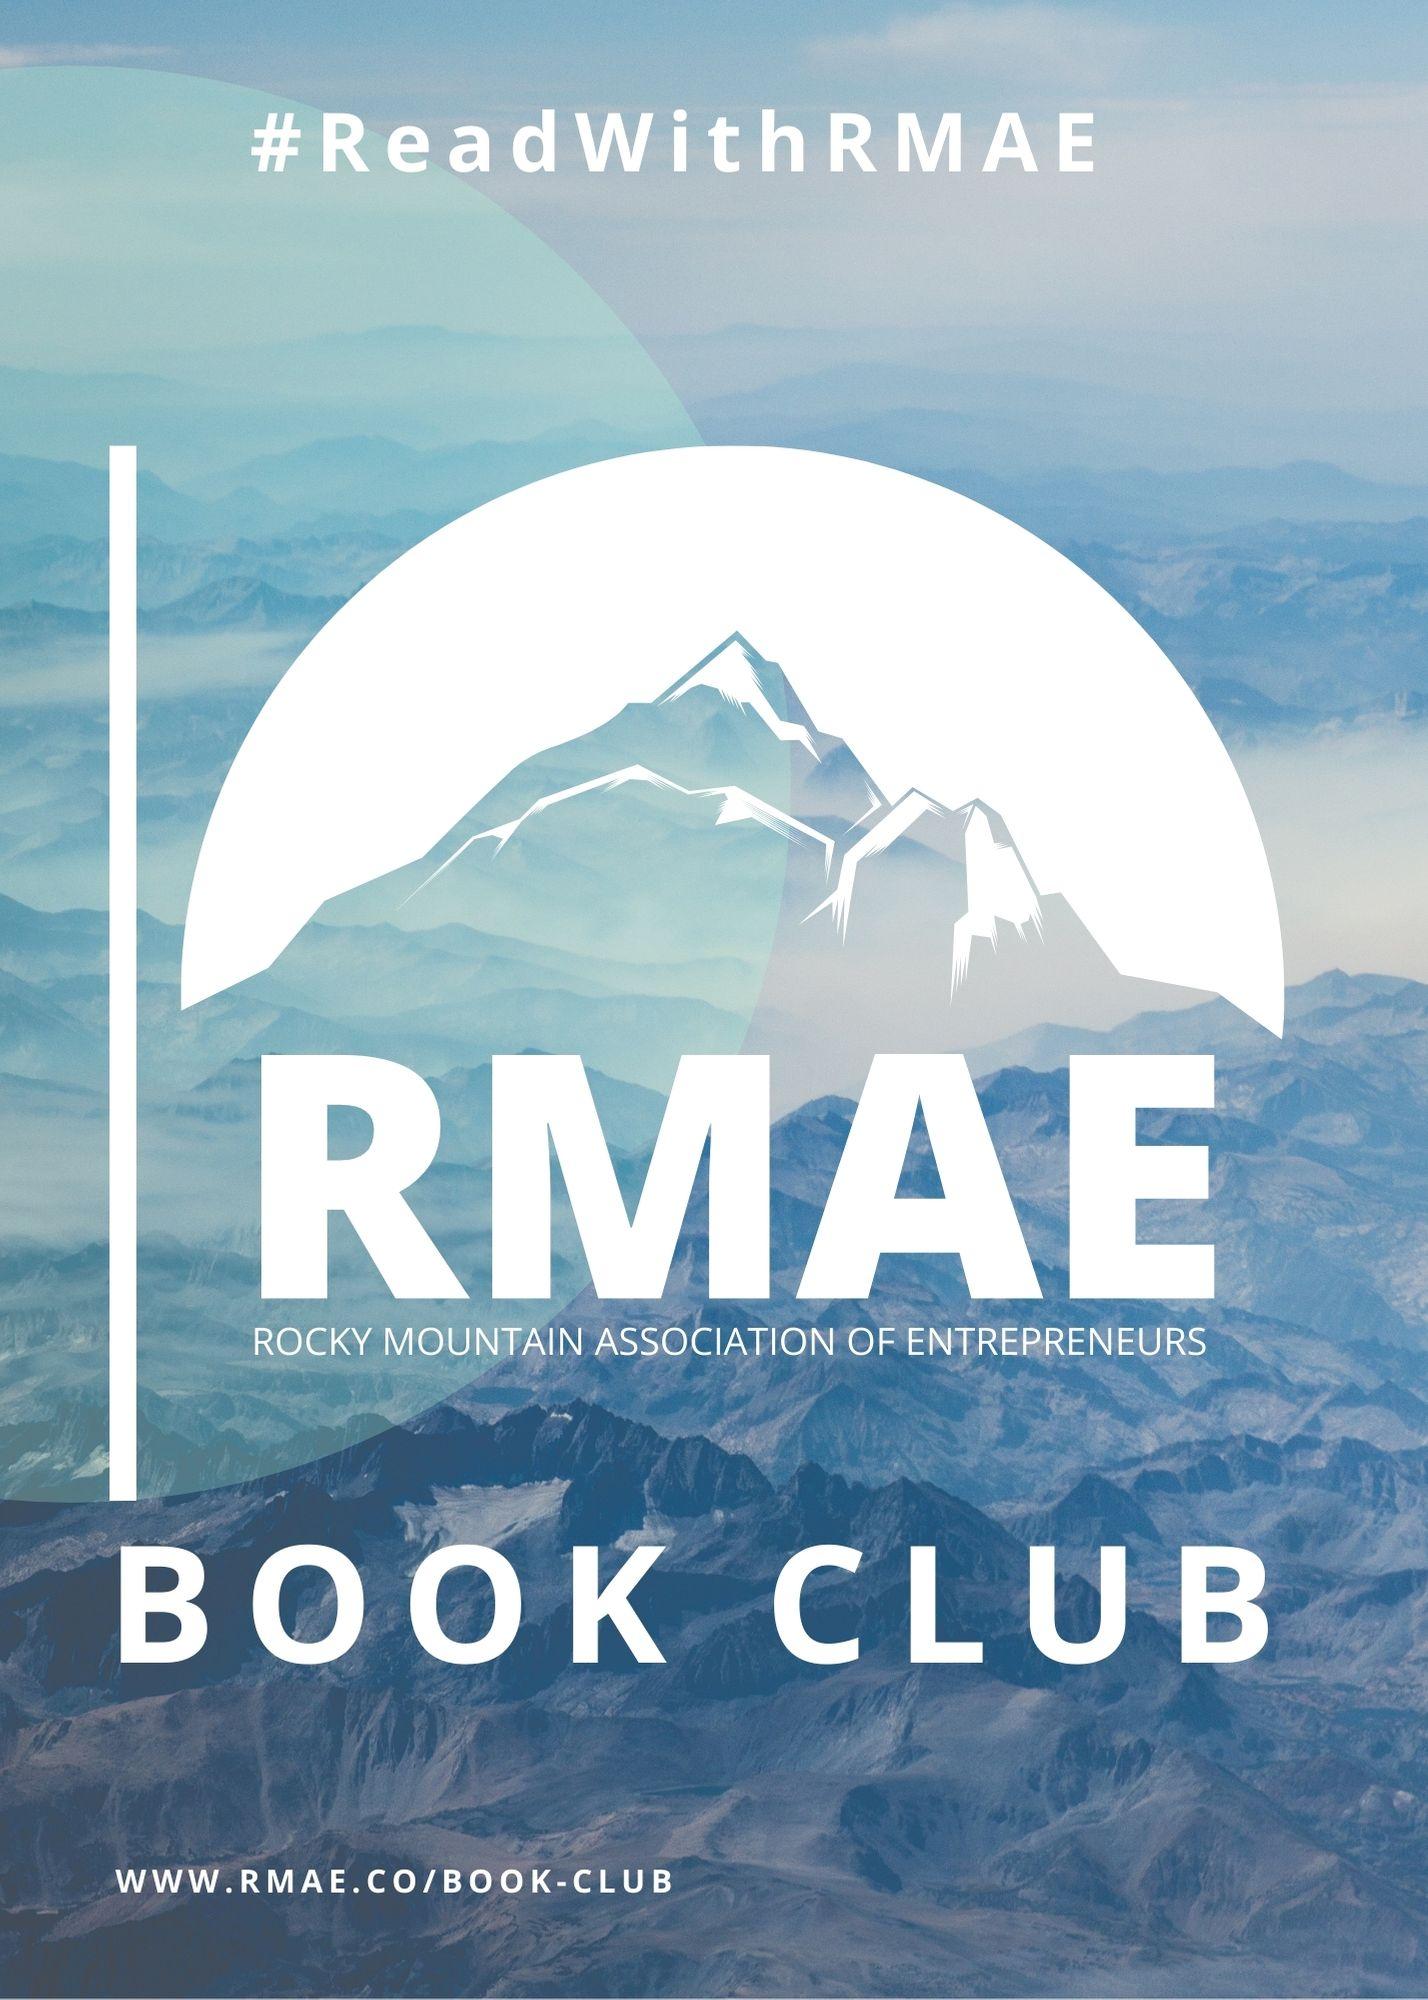 RMAE Book Club